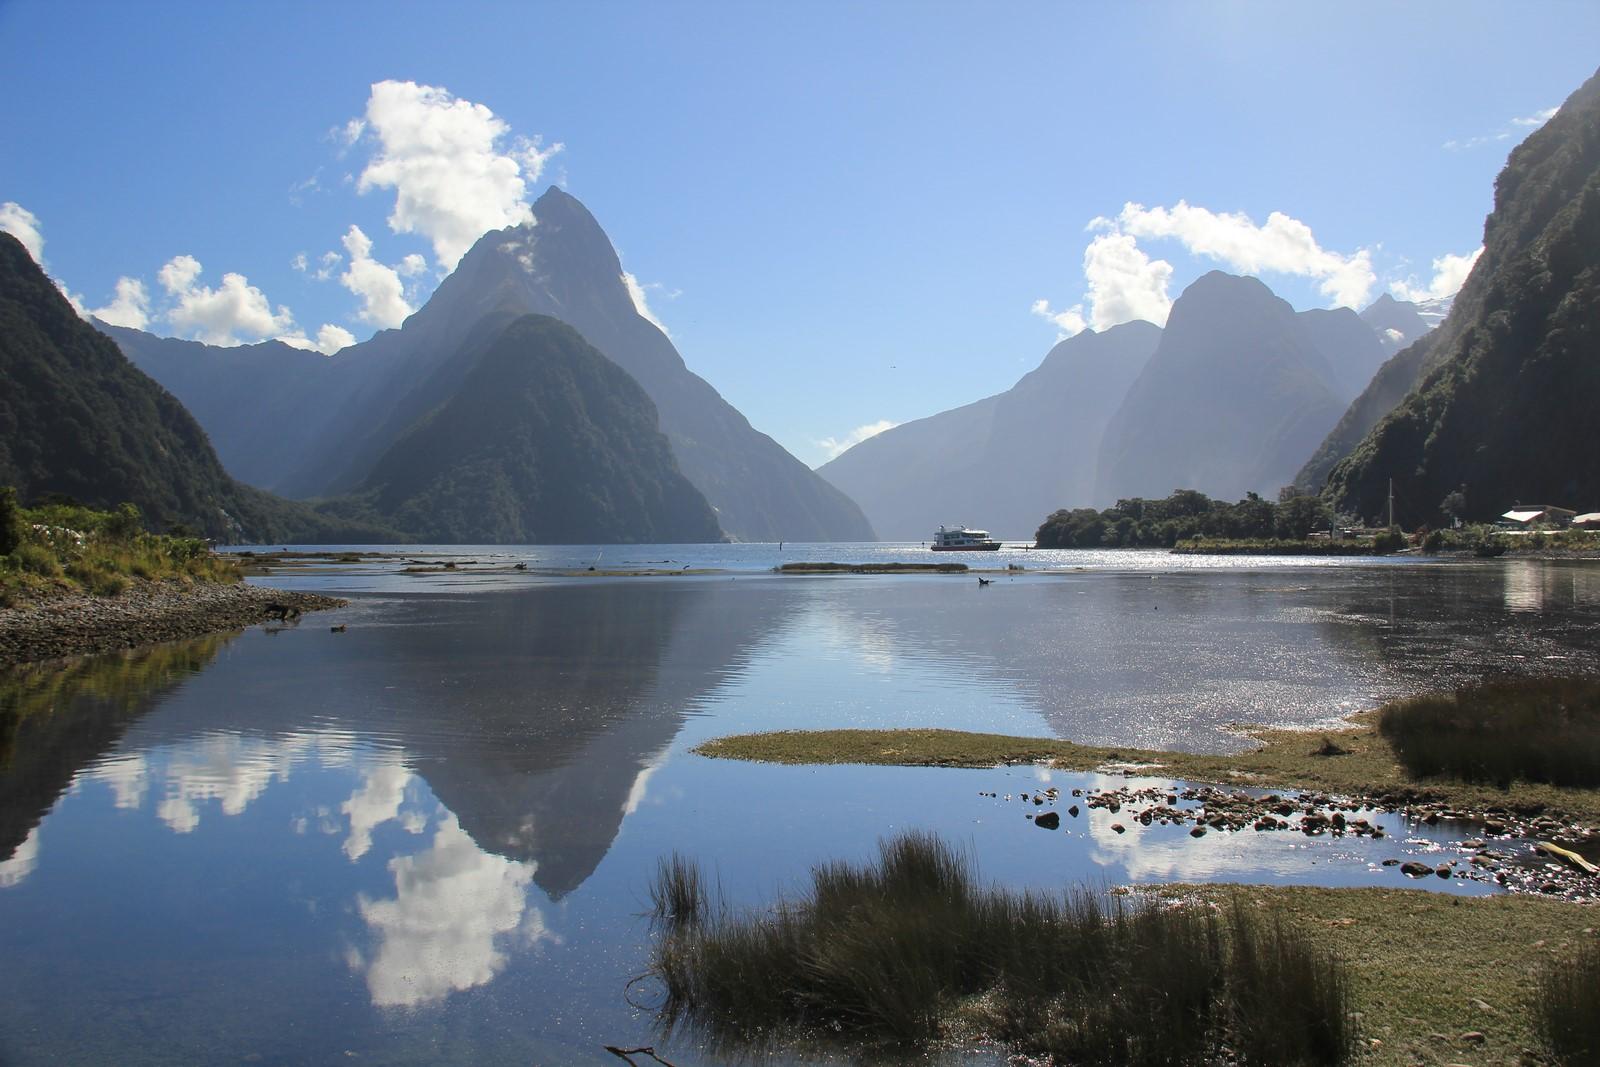 Jours 208 & 209 : Région du Fiordland – Key Summit & Milford Sound